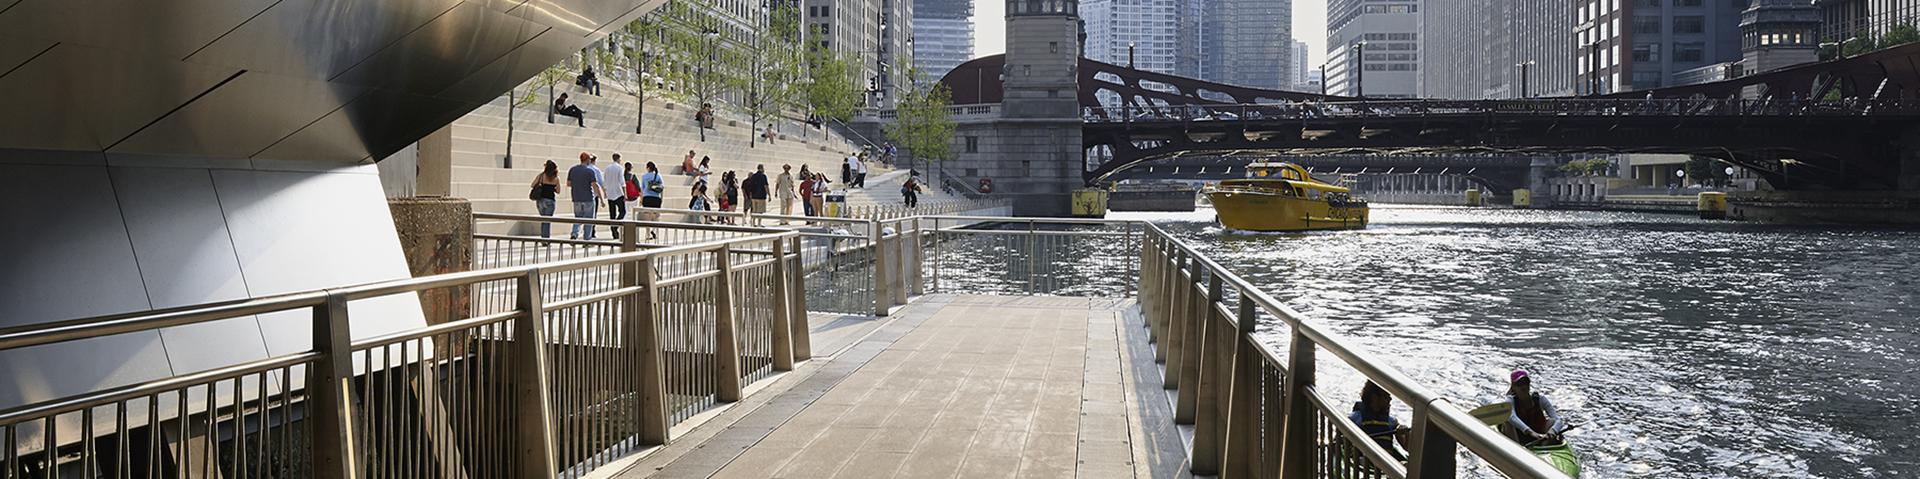 Public Art on the Riverwalk